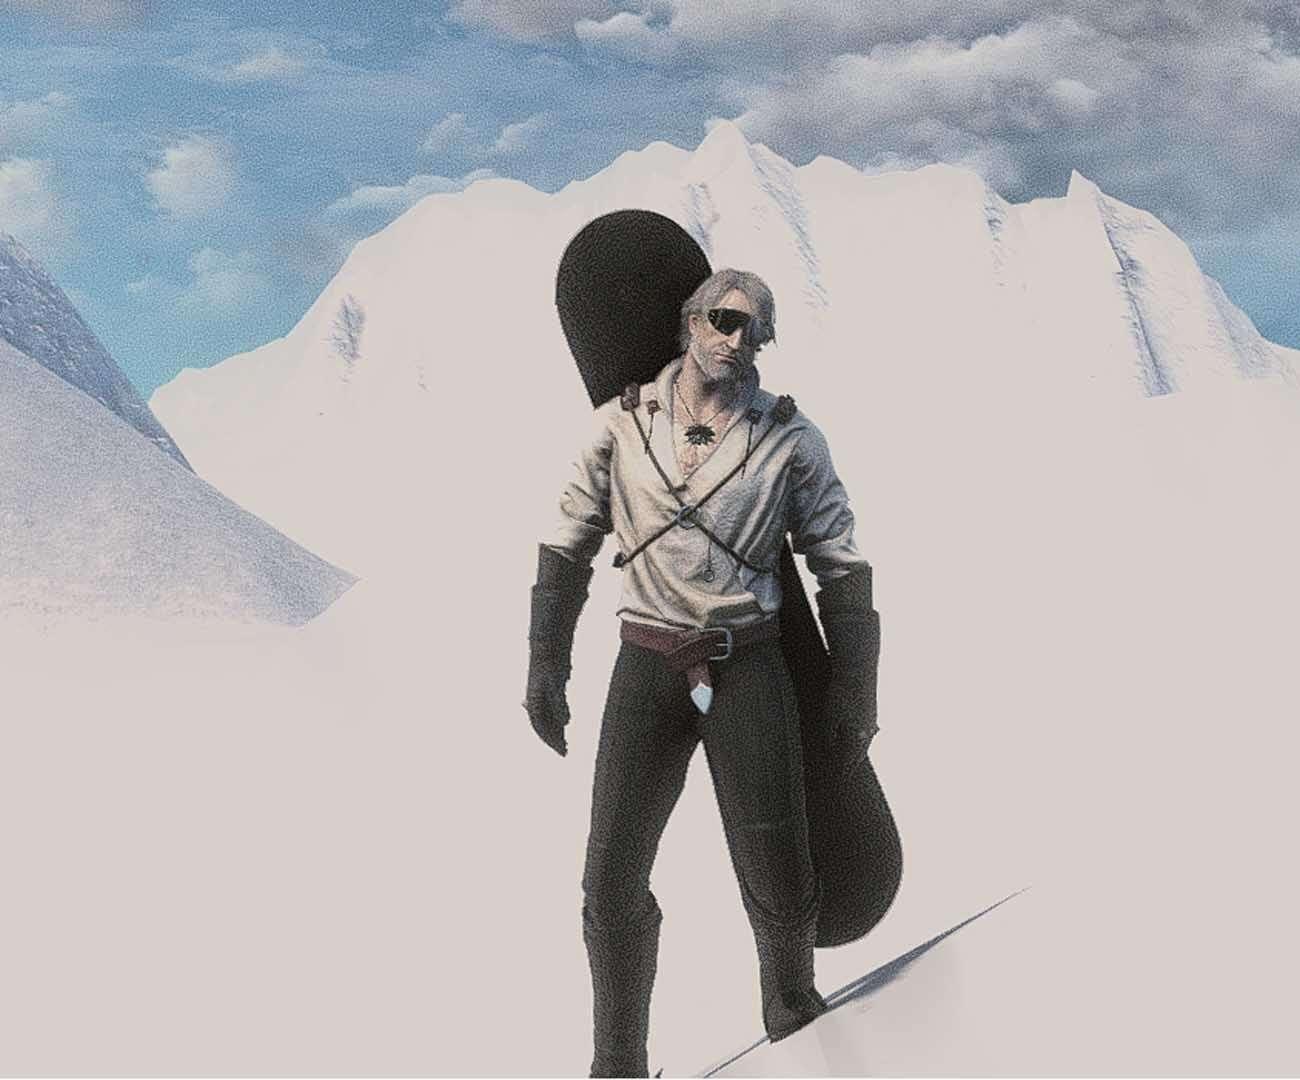 snowboard, wiedźmin 3